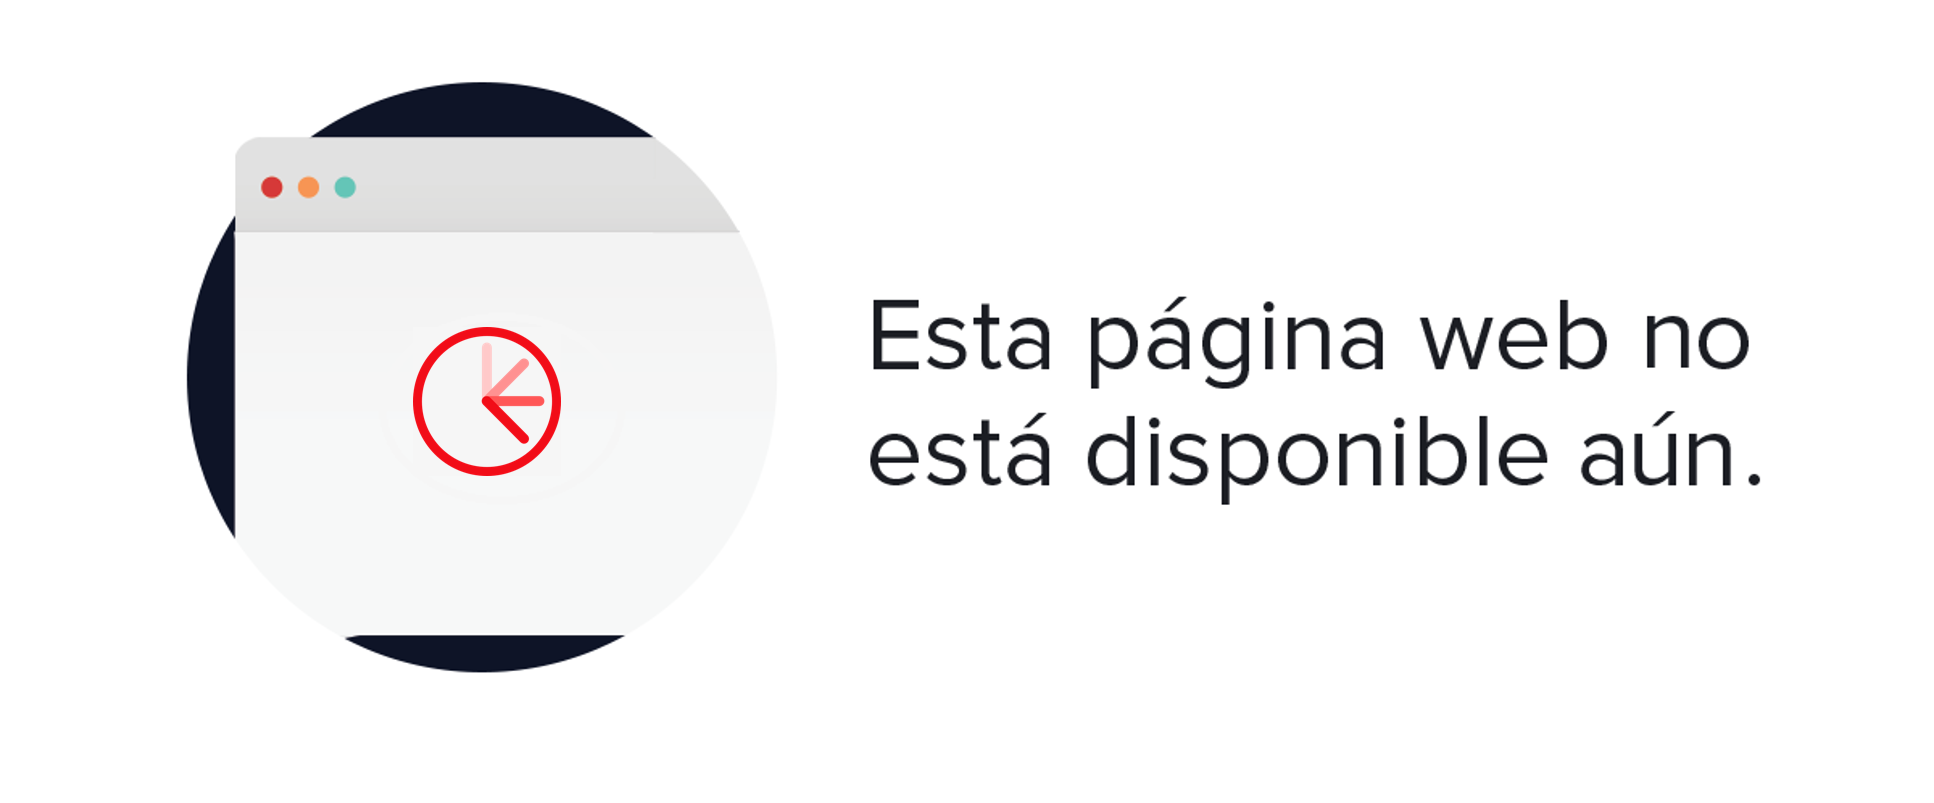 OXXO - Pantalón de mujer OXXO pitillo y tobillero Naranja 8681613250222 - CXGXOVX